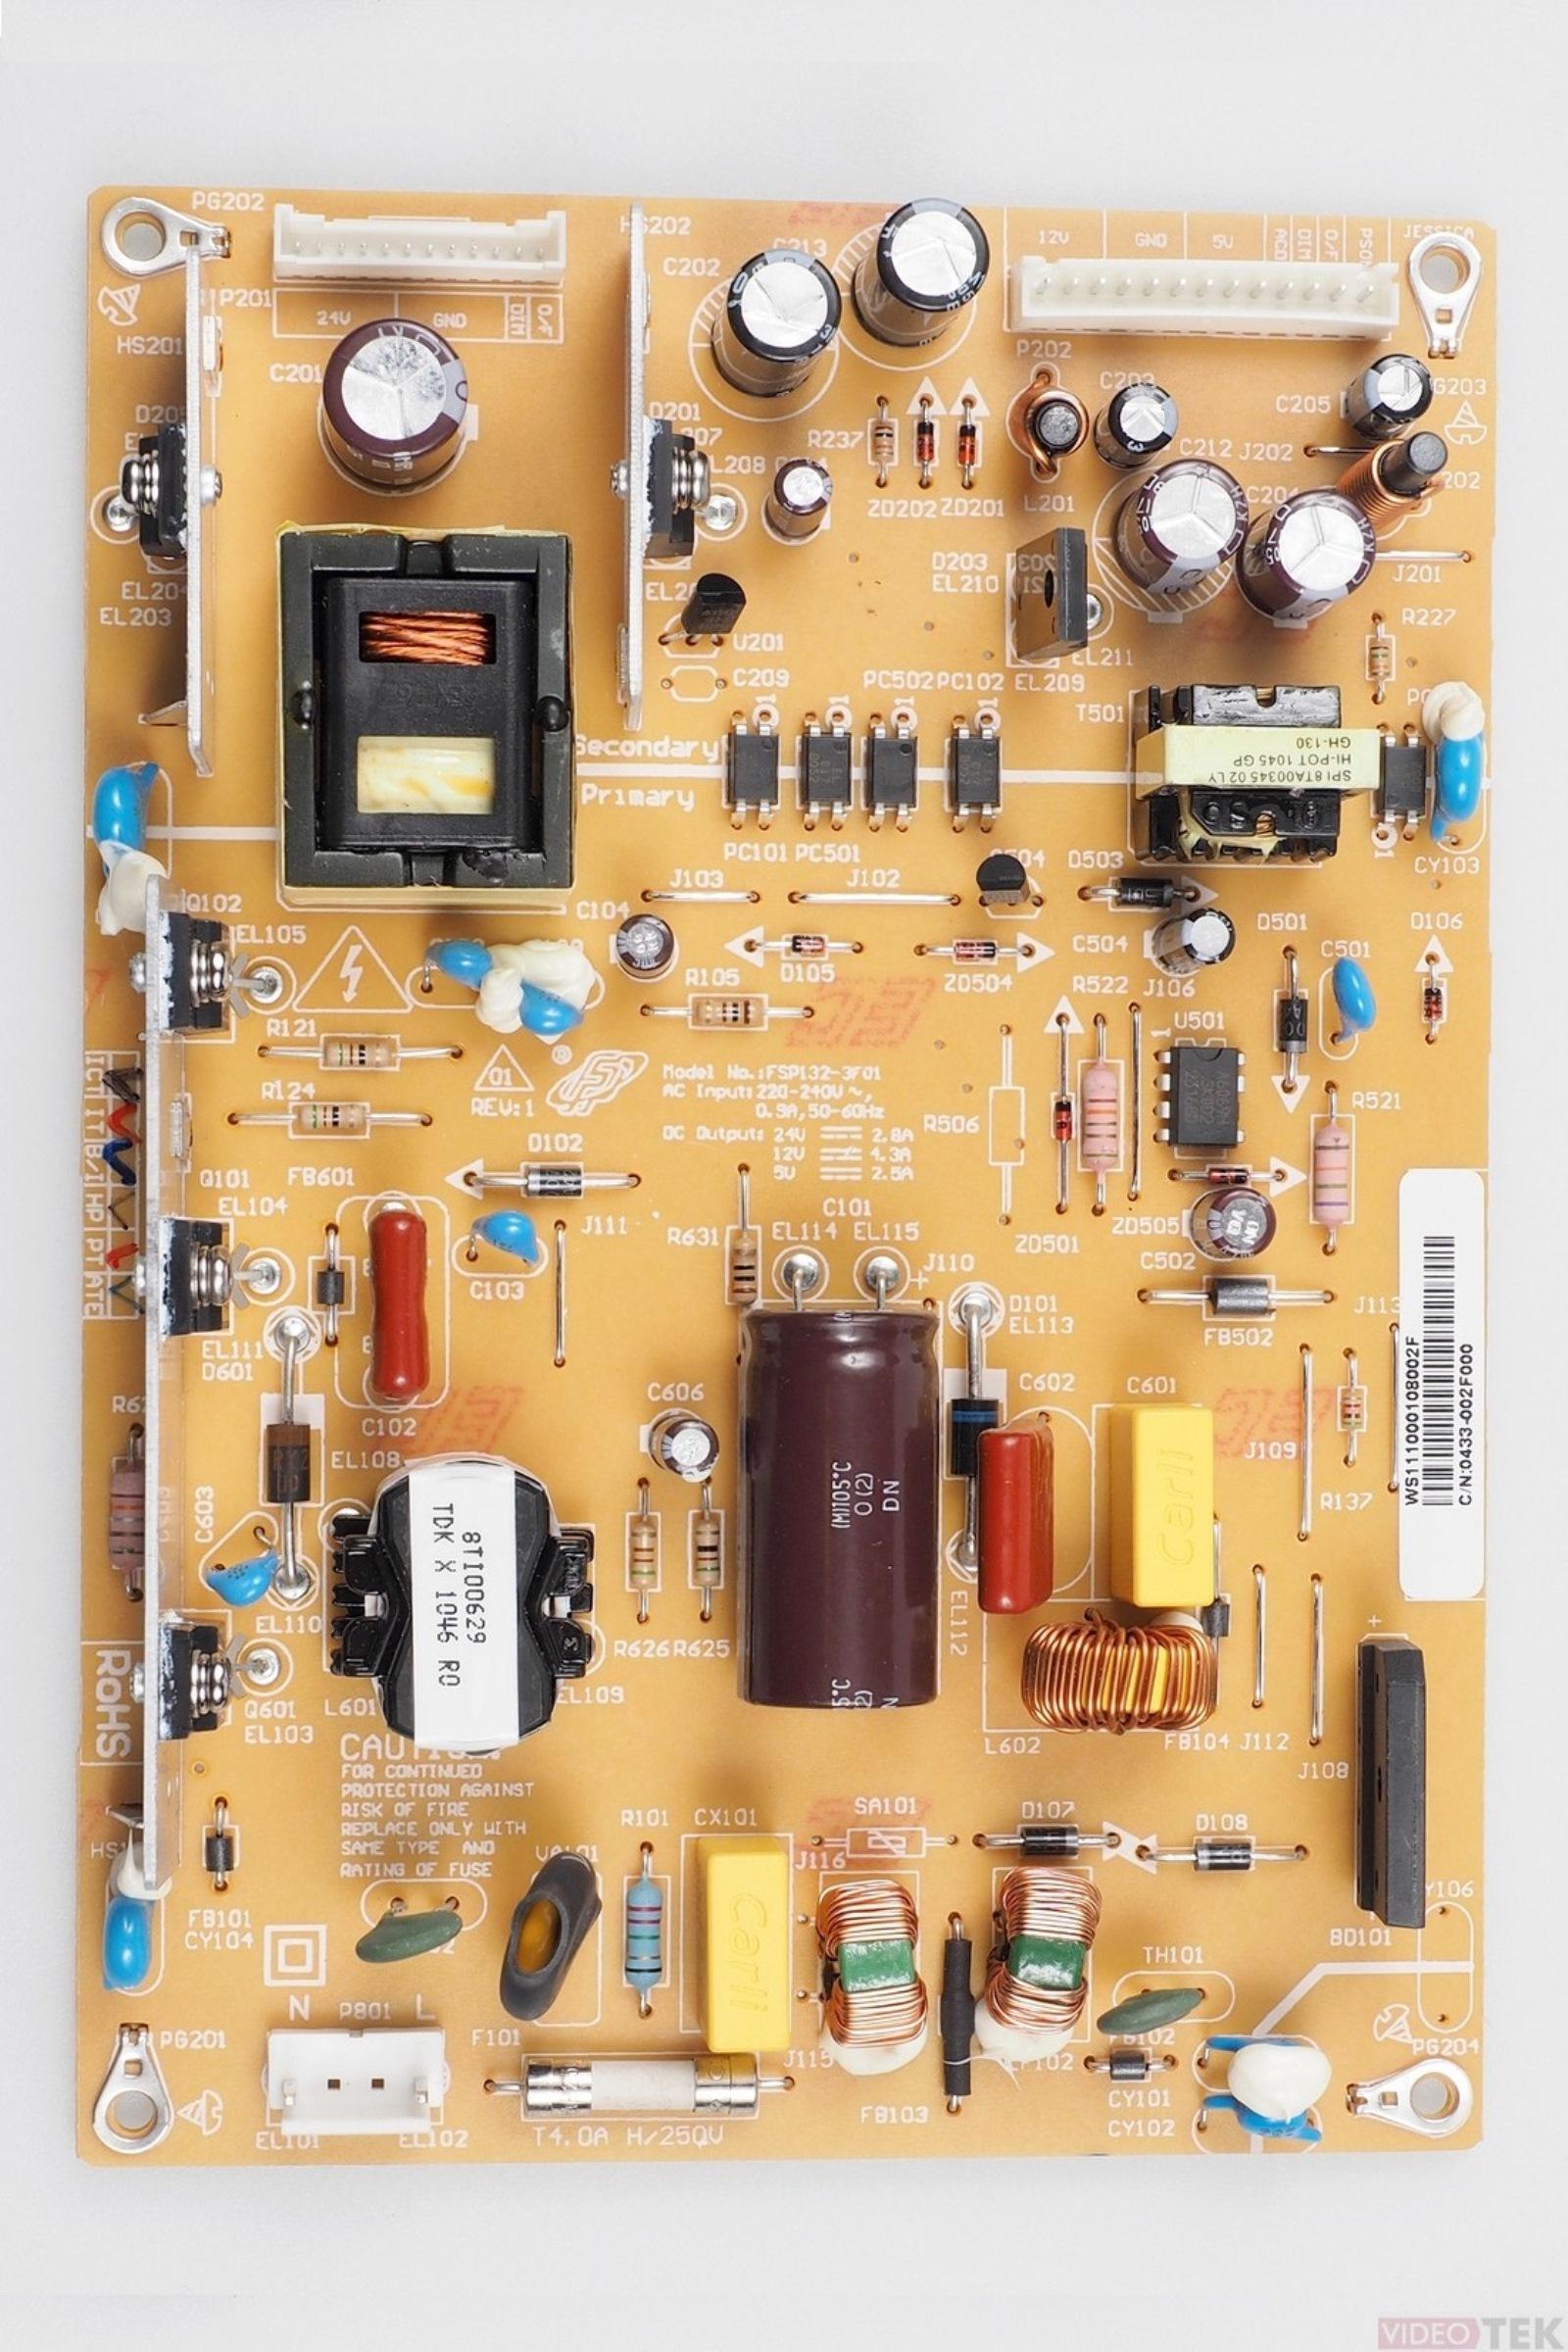 PL ALIM LCD TOSHIBA FSP132-3F01 75018688